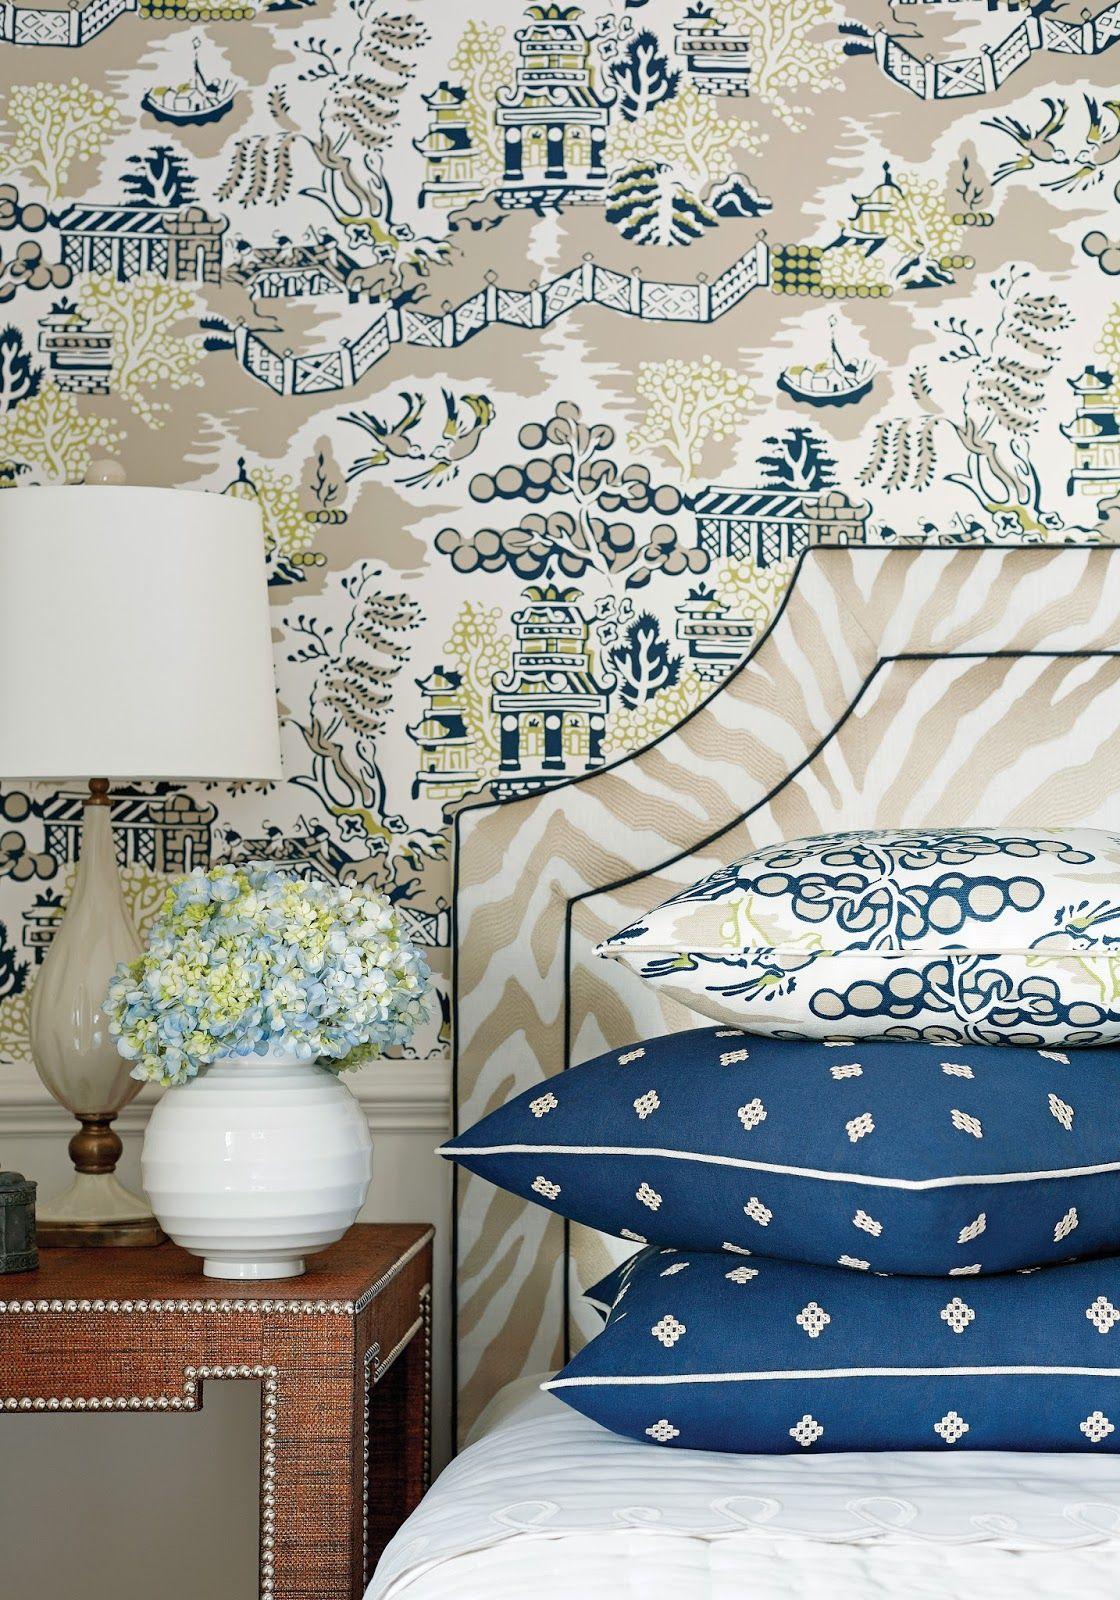 Chinoiserie Chic: New Thibaut Collection #fabric #interiordesign